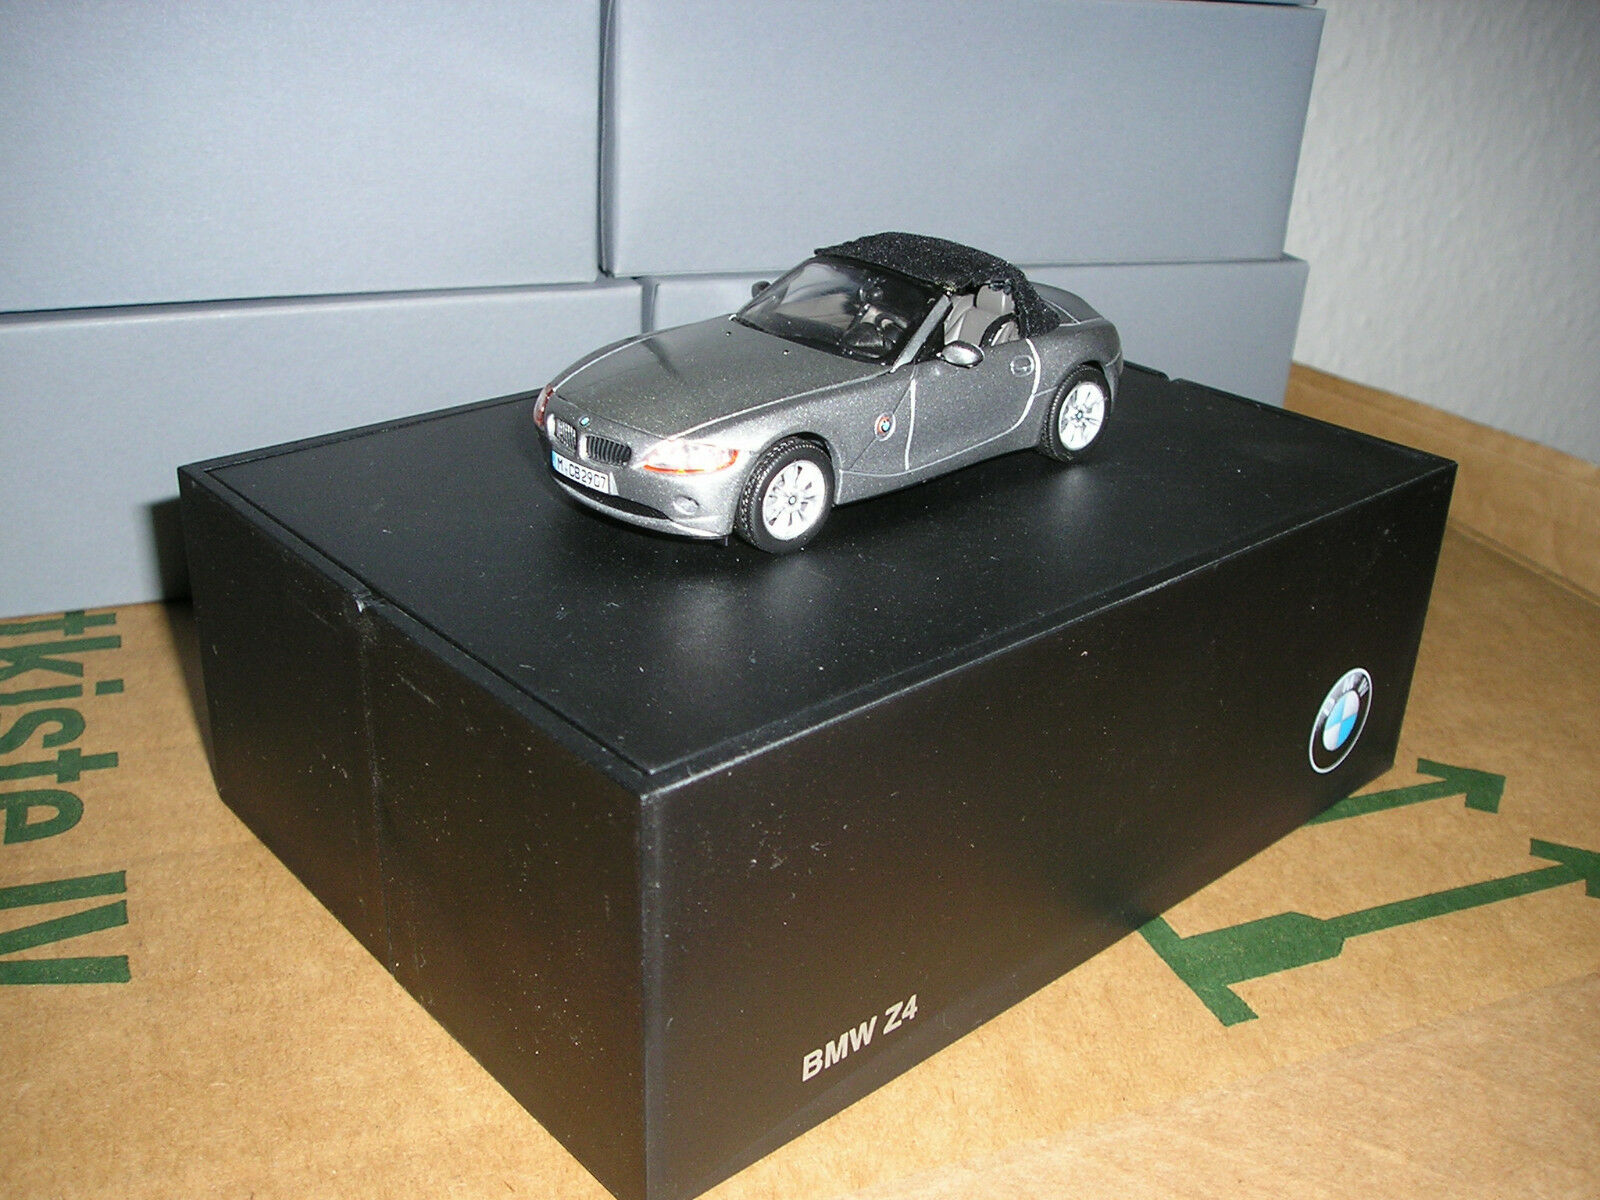 12x bmw z4 e85 modelo coches Sterling gris, m 1 43 norev